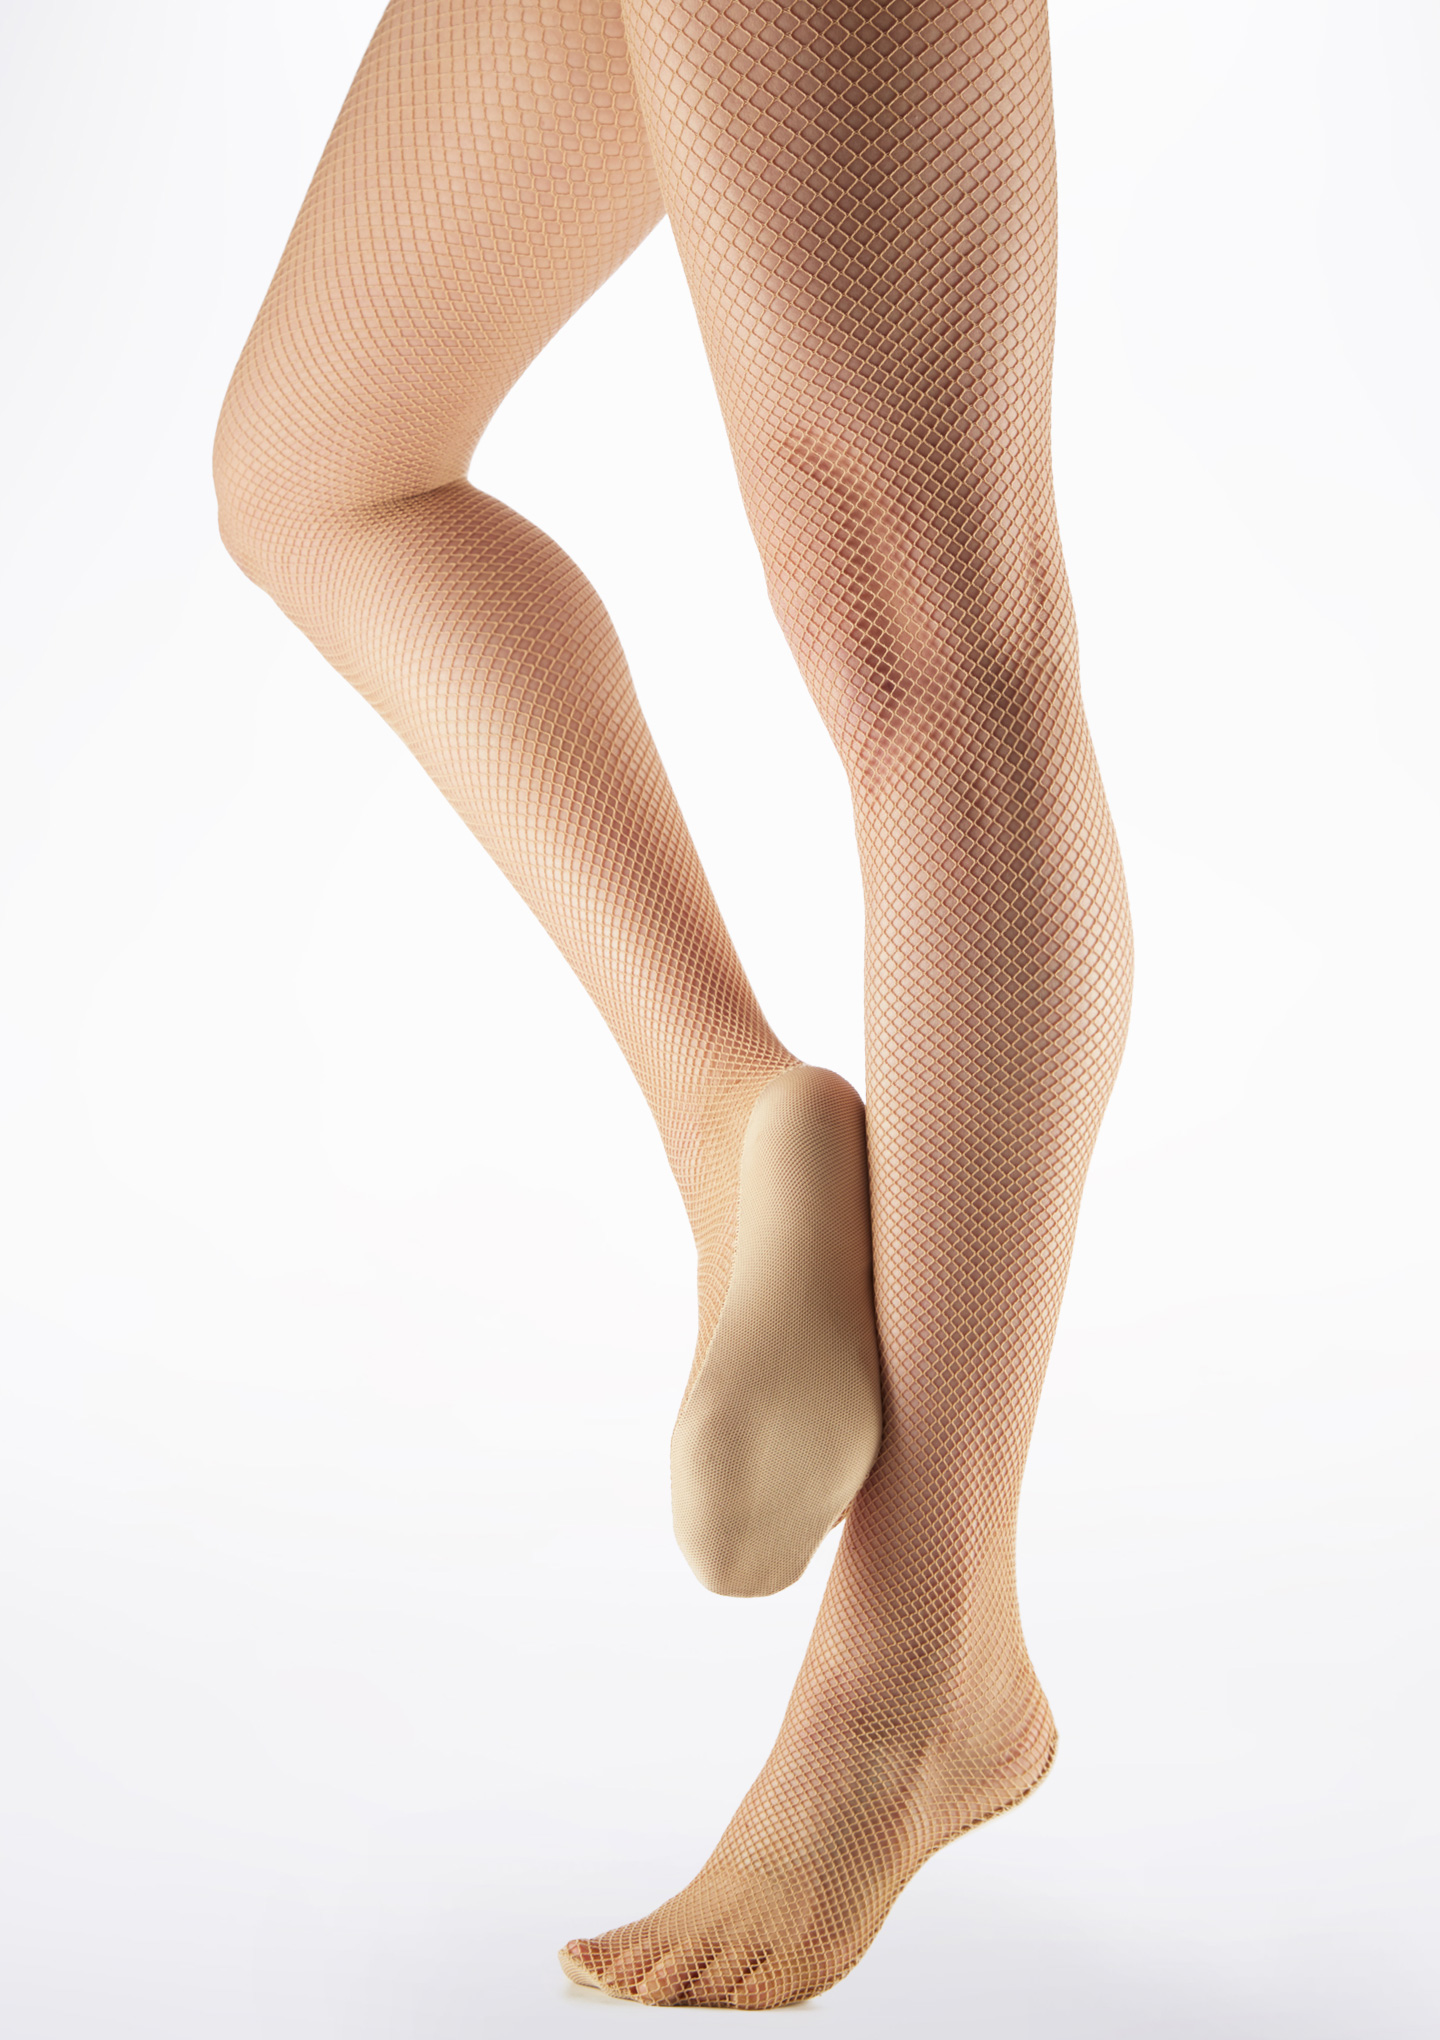 Collants Resille Danse Professionnels Move Bronzage Leger Marron image principale. [Marron]